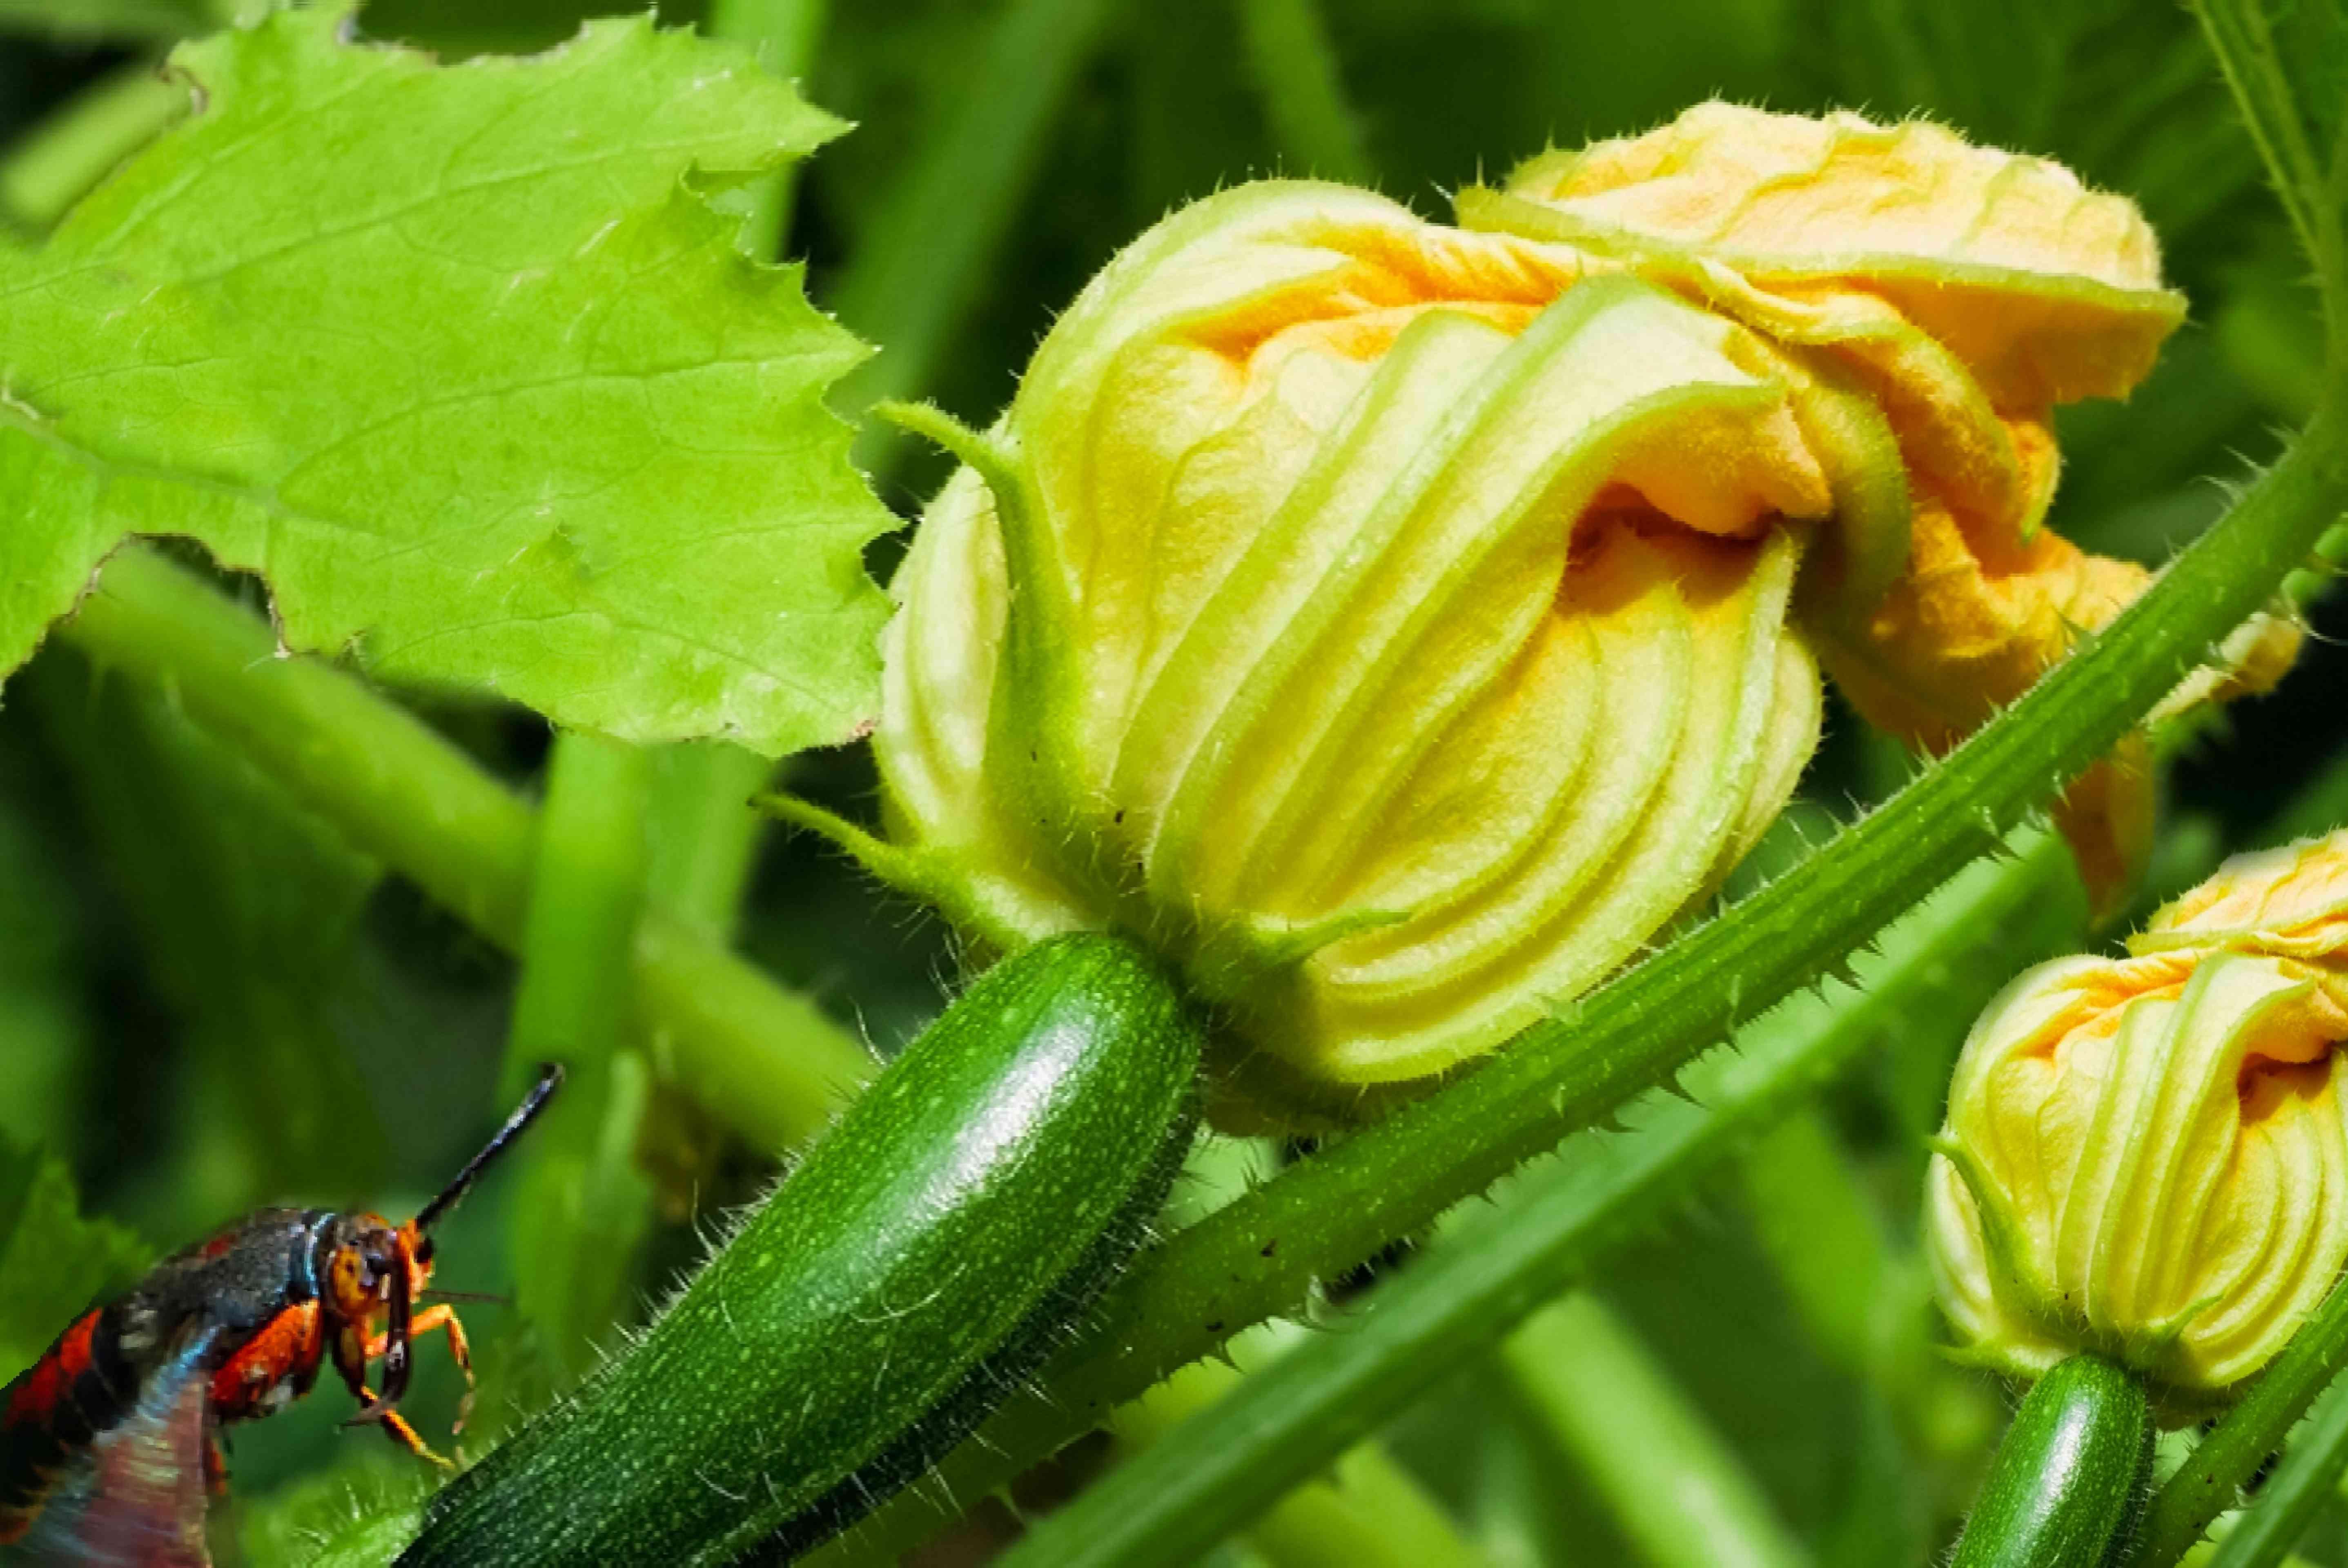 zucchini pests